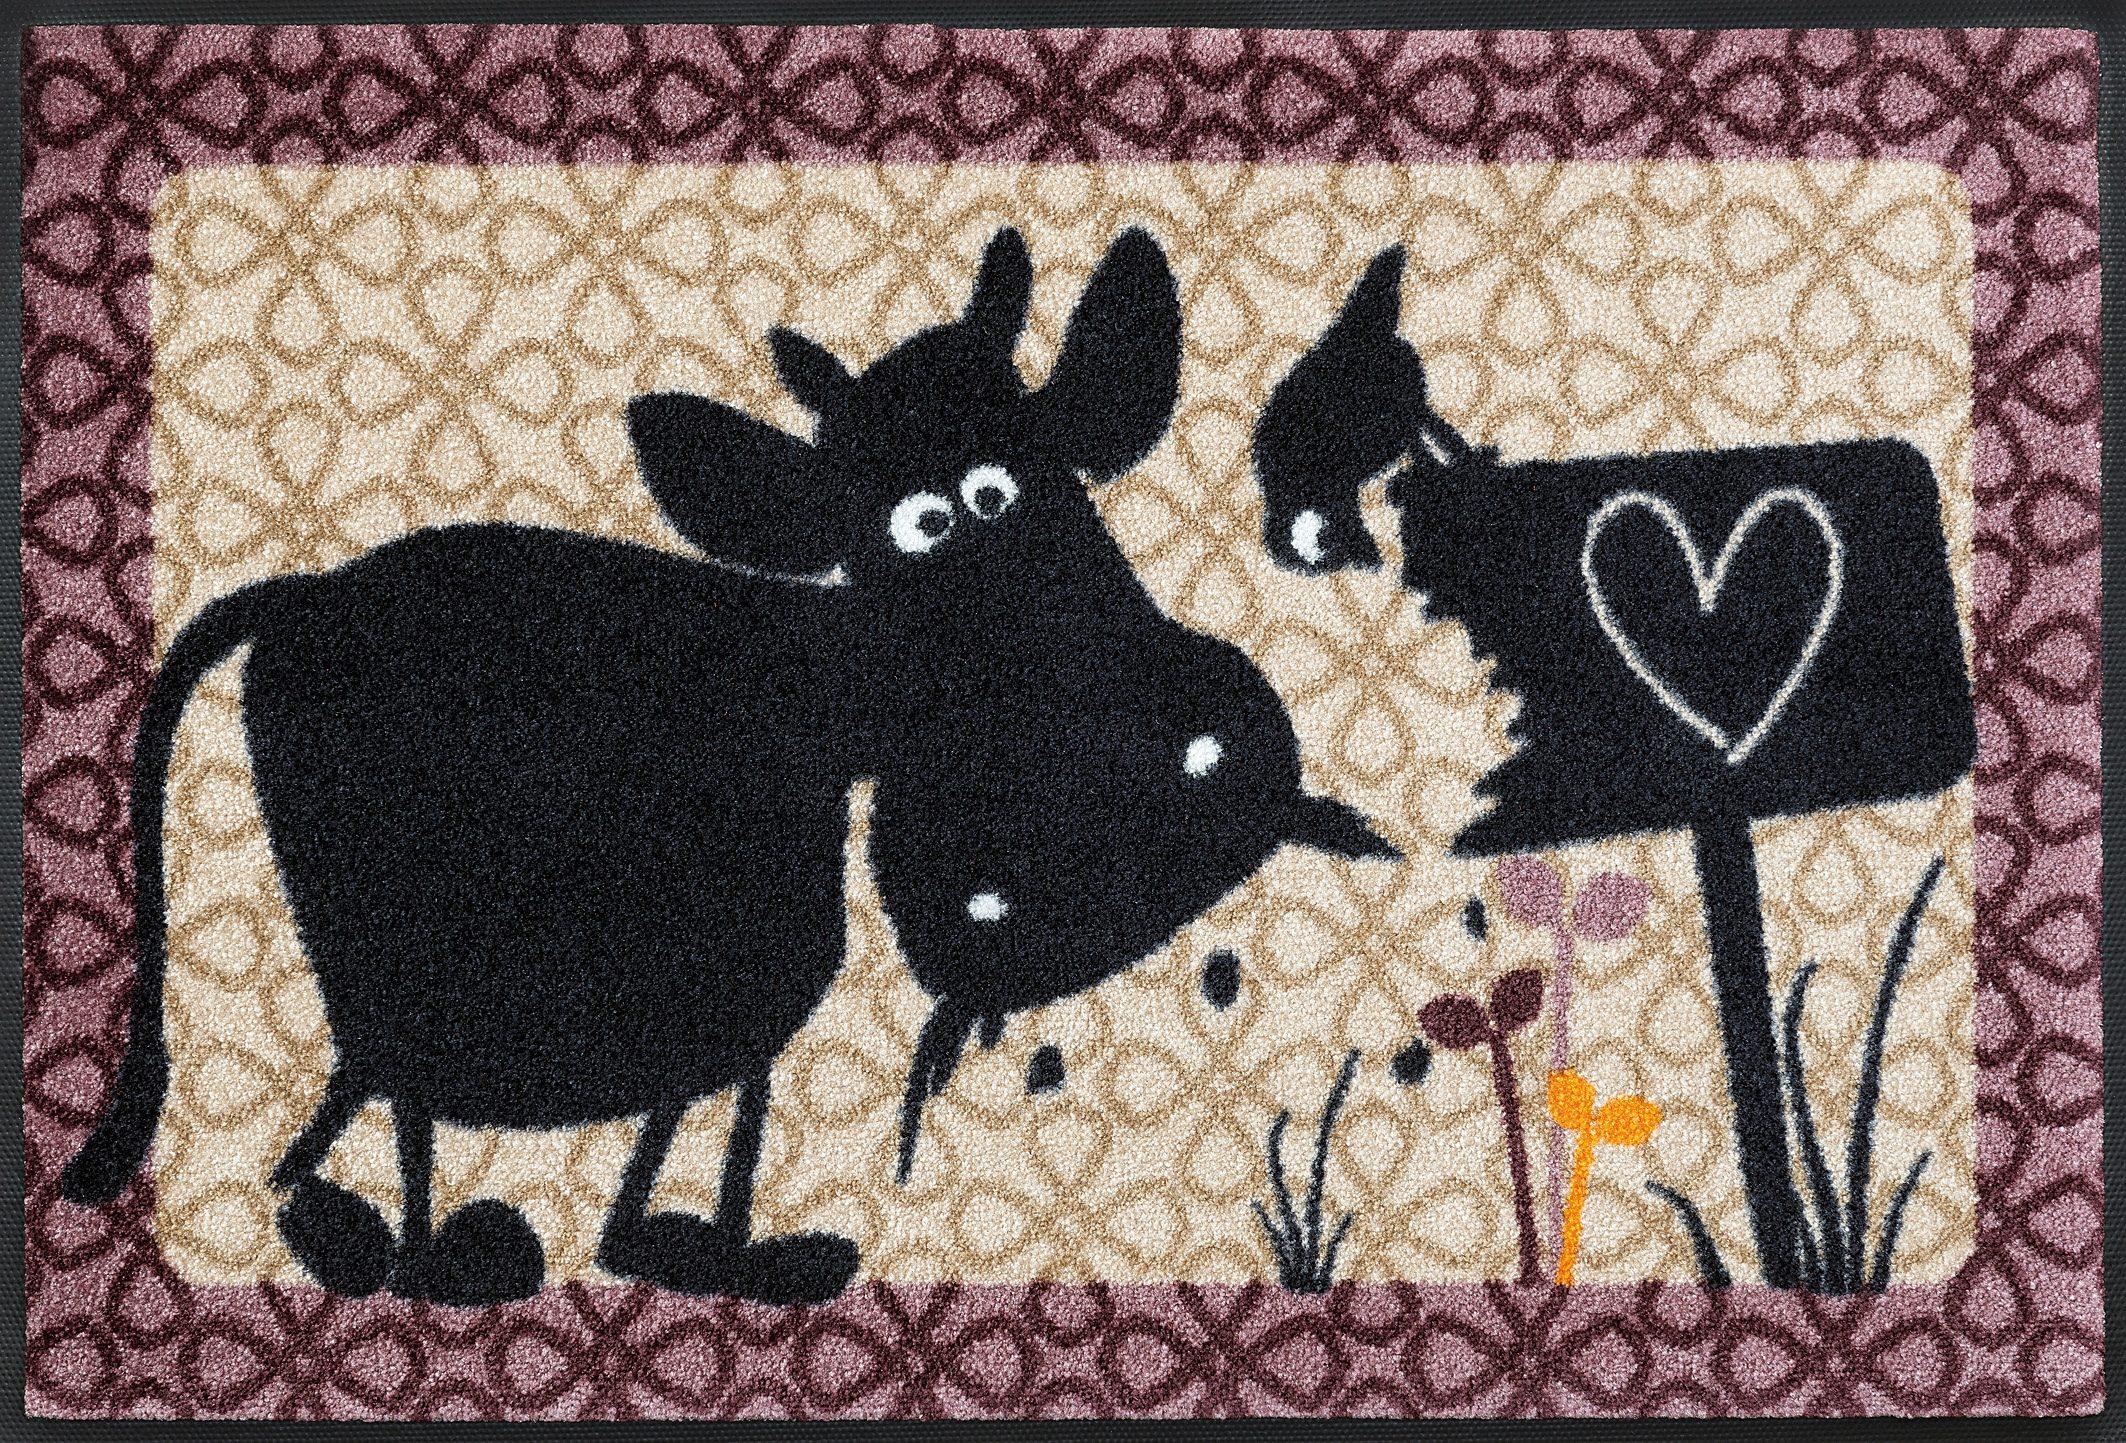 Fußmatte »Kuh Erika & Fred«, wash+dry by Kleen-Tex, rechteckig, Höhe 7 mm